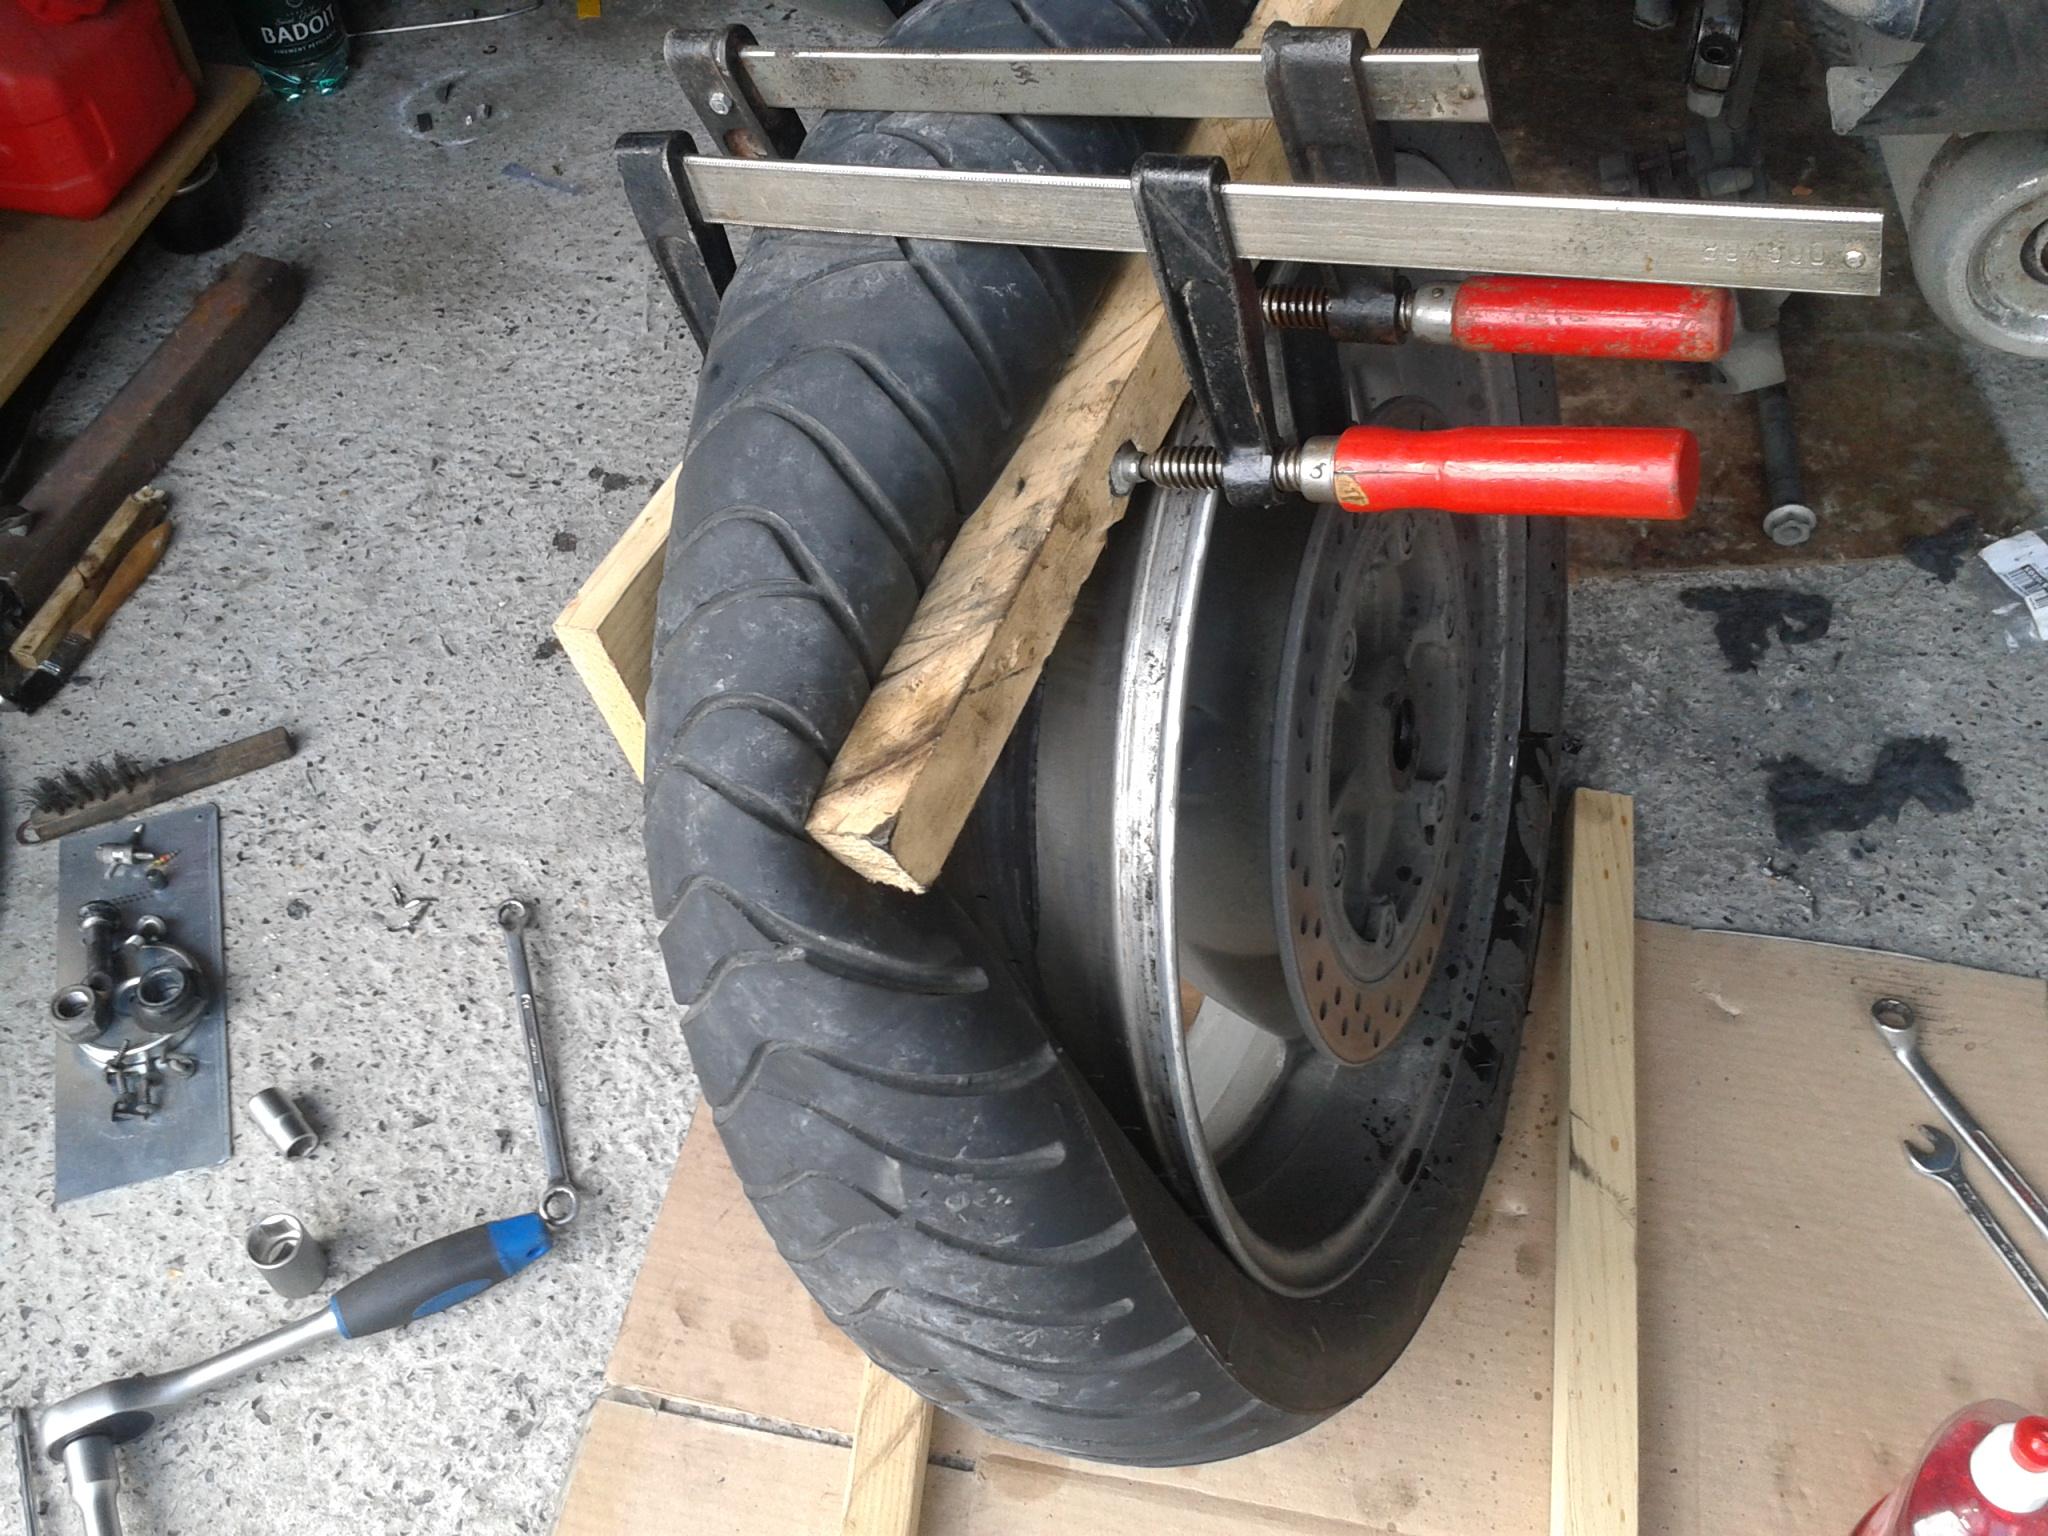 changer ses pneus sois m me moostik 125cc 39 s. Black Bedroom Furniture Sets. Home Design Ideas